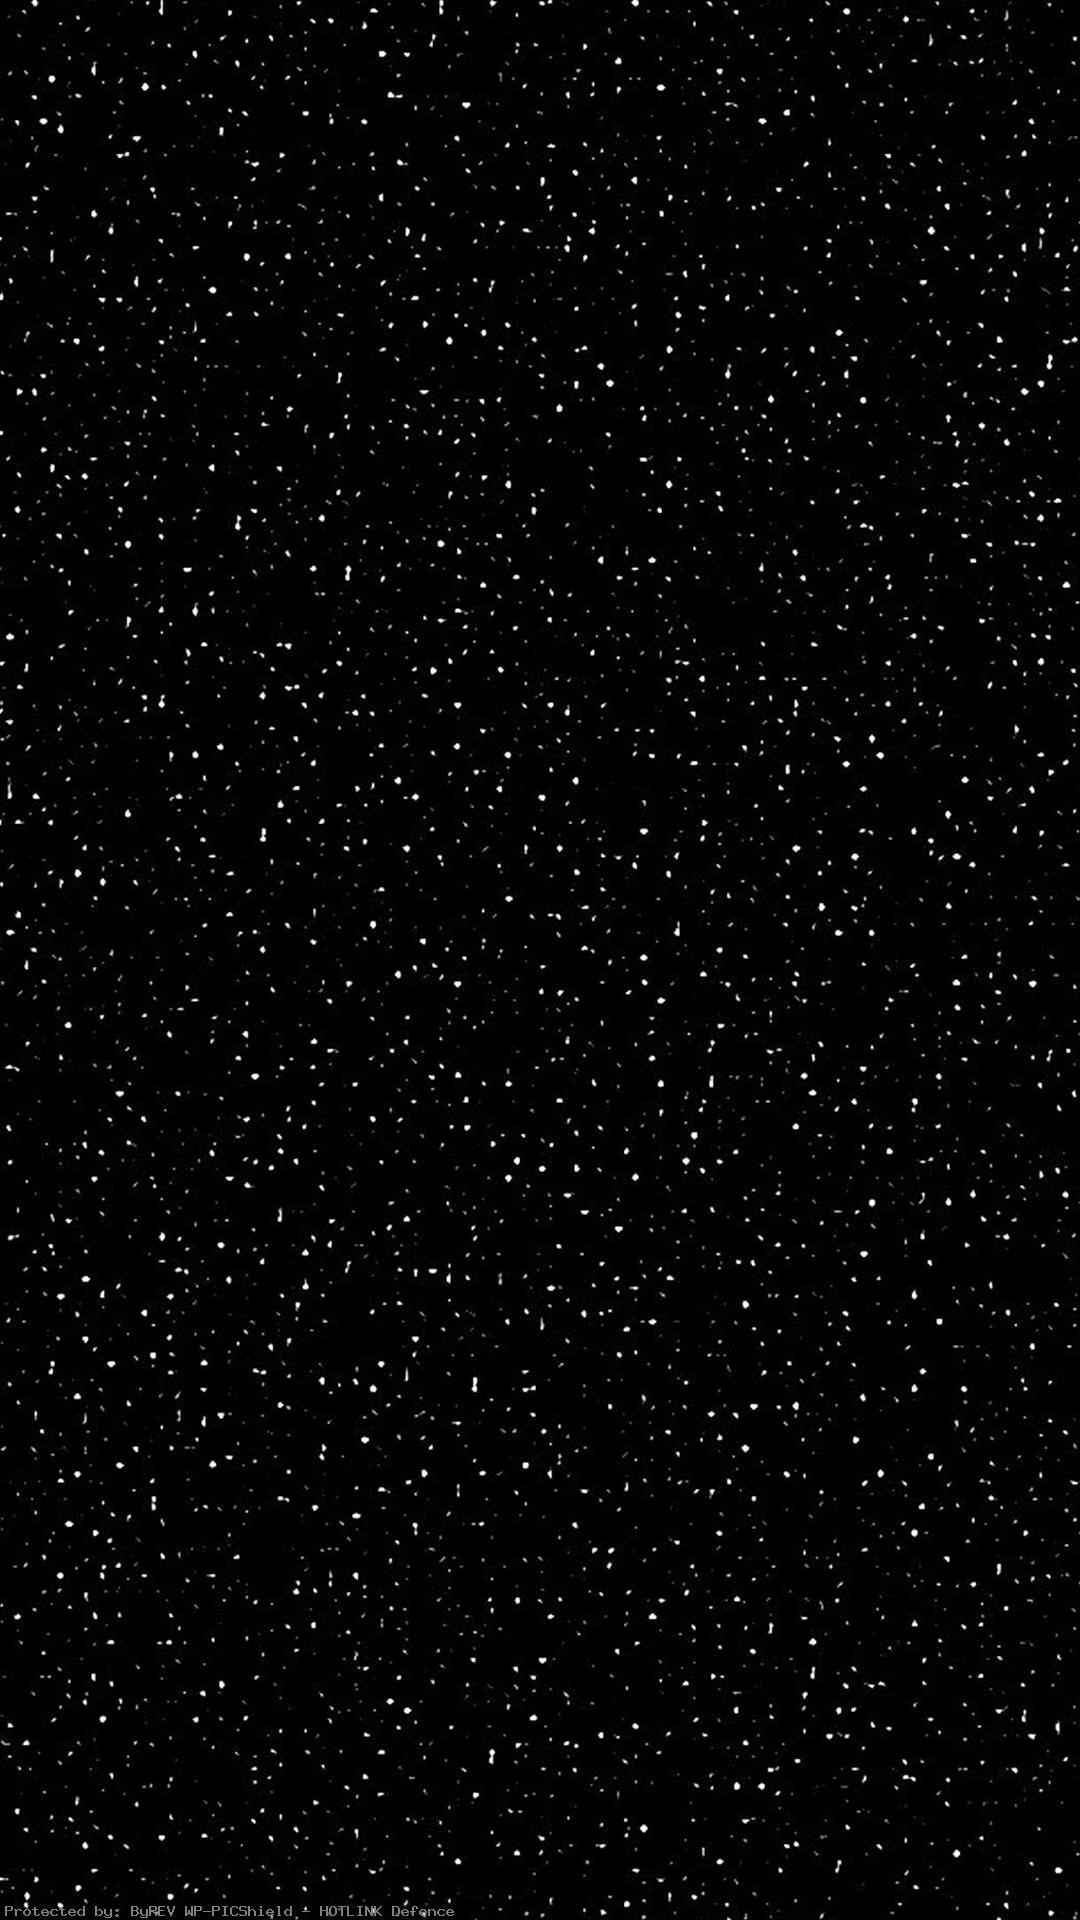 Simple-Starry-Sky-Field-iPhone-wallpaper-wp60011829